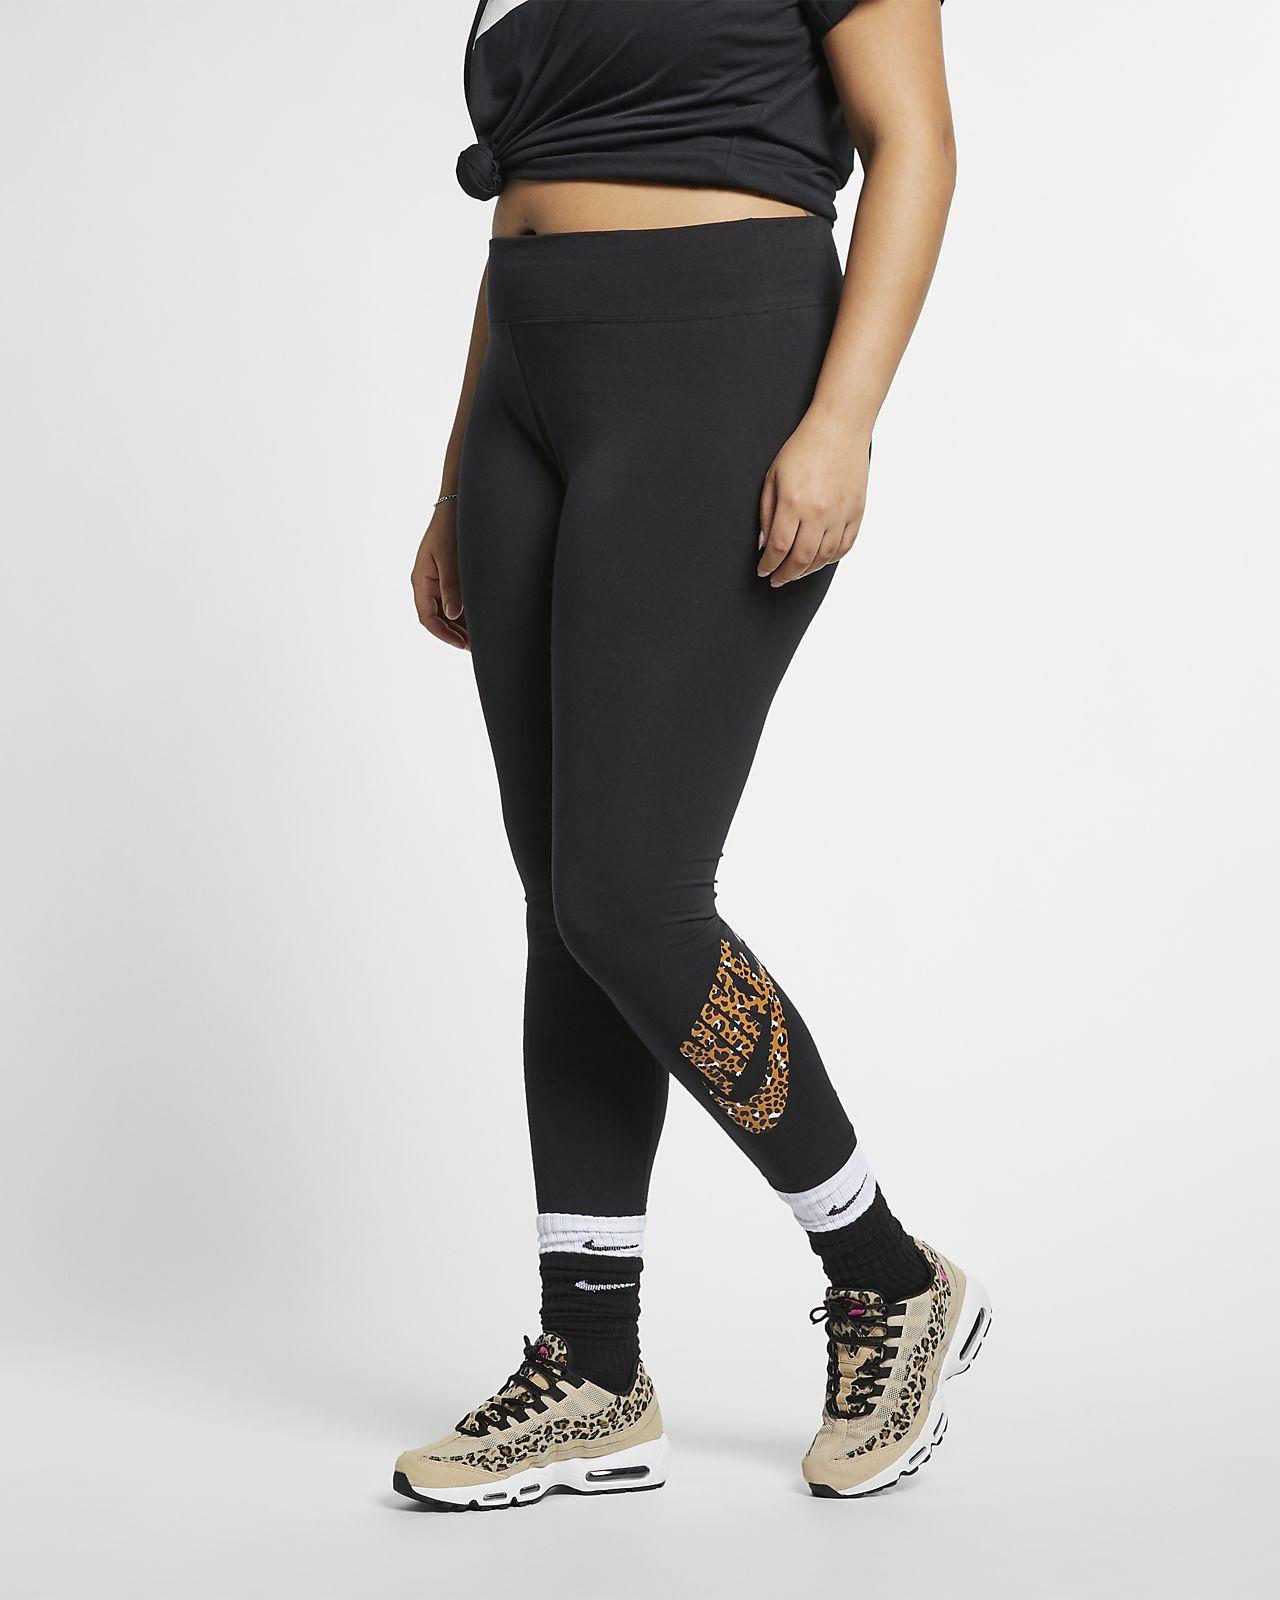 502544ad7e0 Nike Sportswear Animal Print Women s Leggings (Plus Size). Nike.com GB